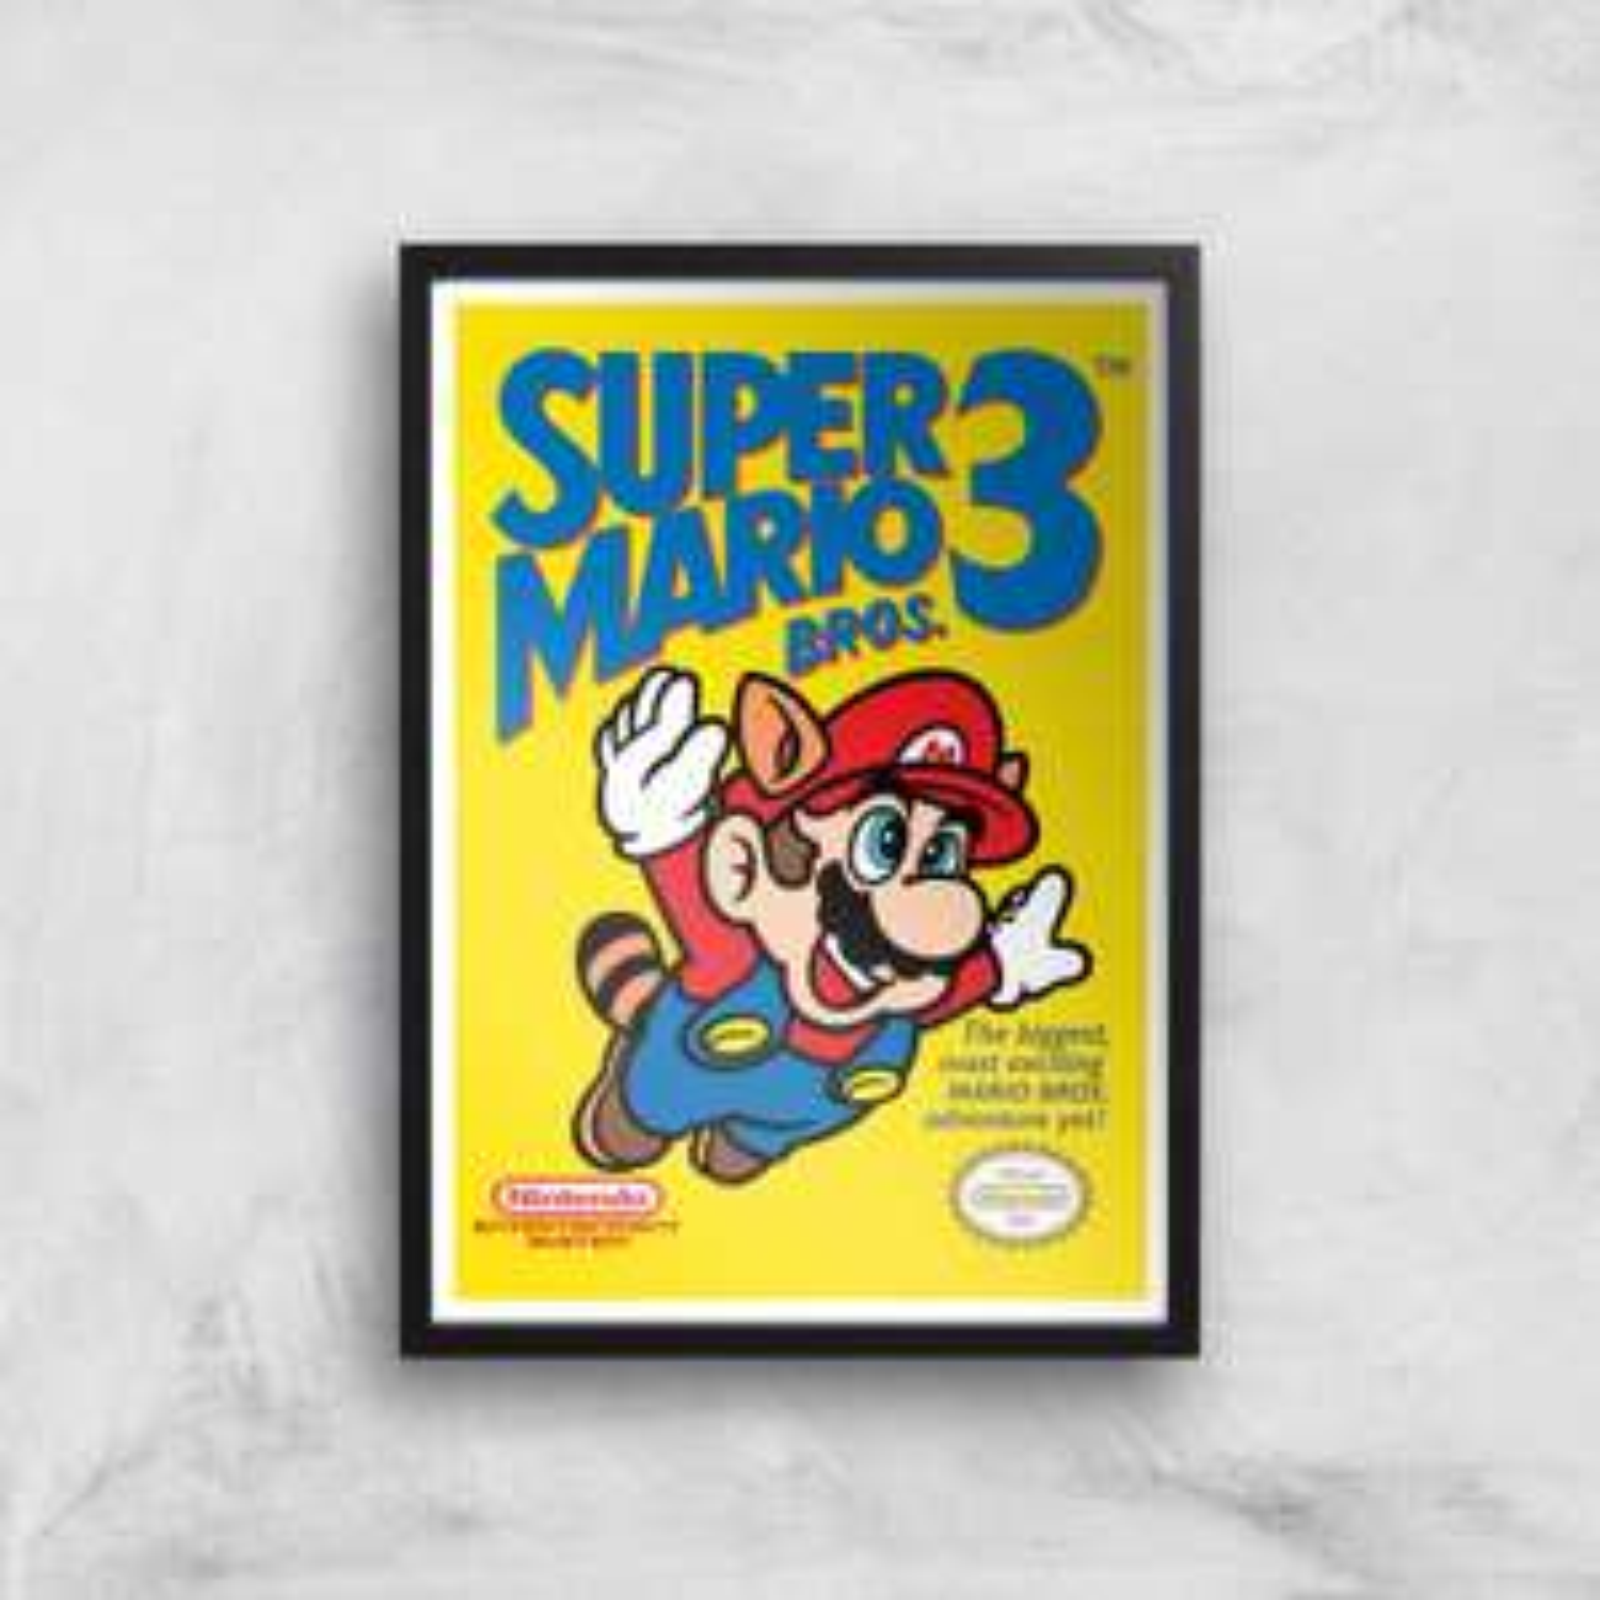 25% Rabatt auf Kunstdrucke + gratis Versand, z.B. NINTENDO Super Mario Bros 3 (DIN A4)